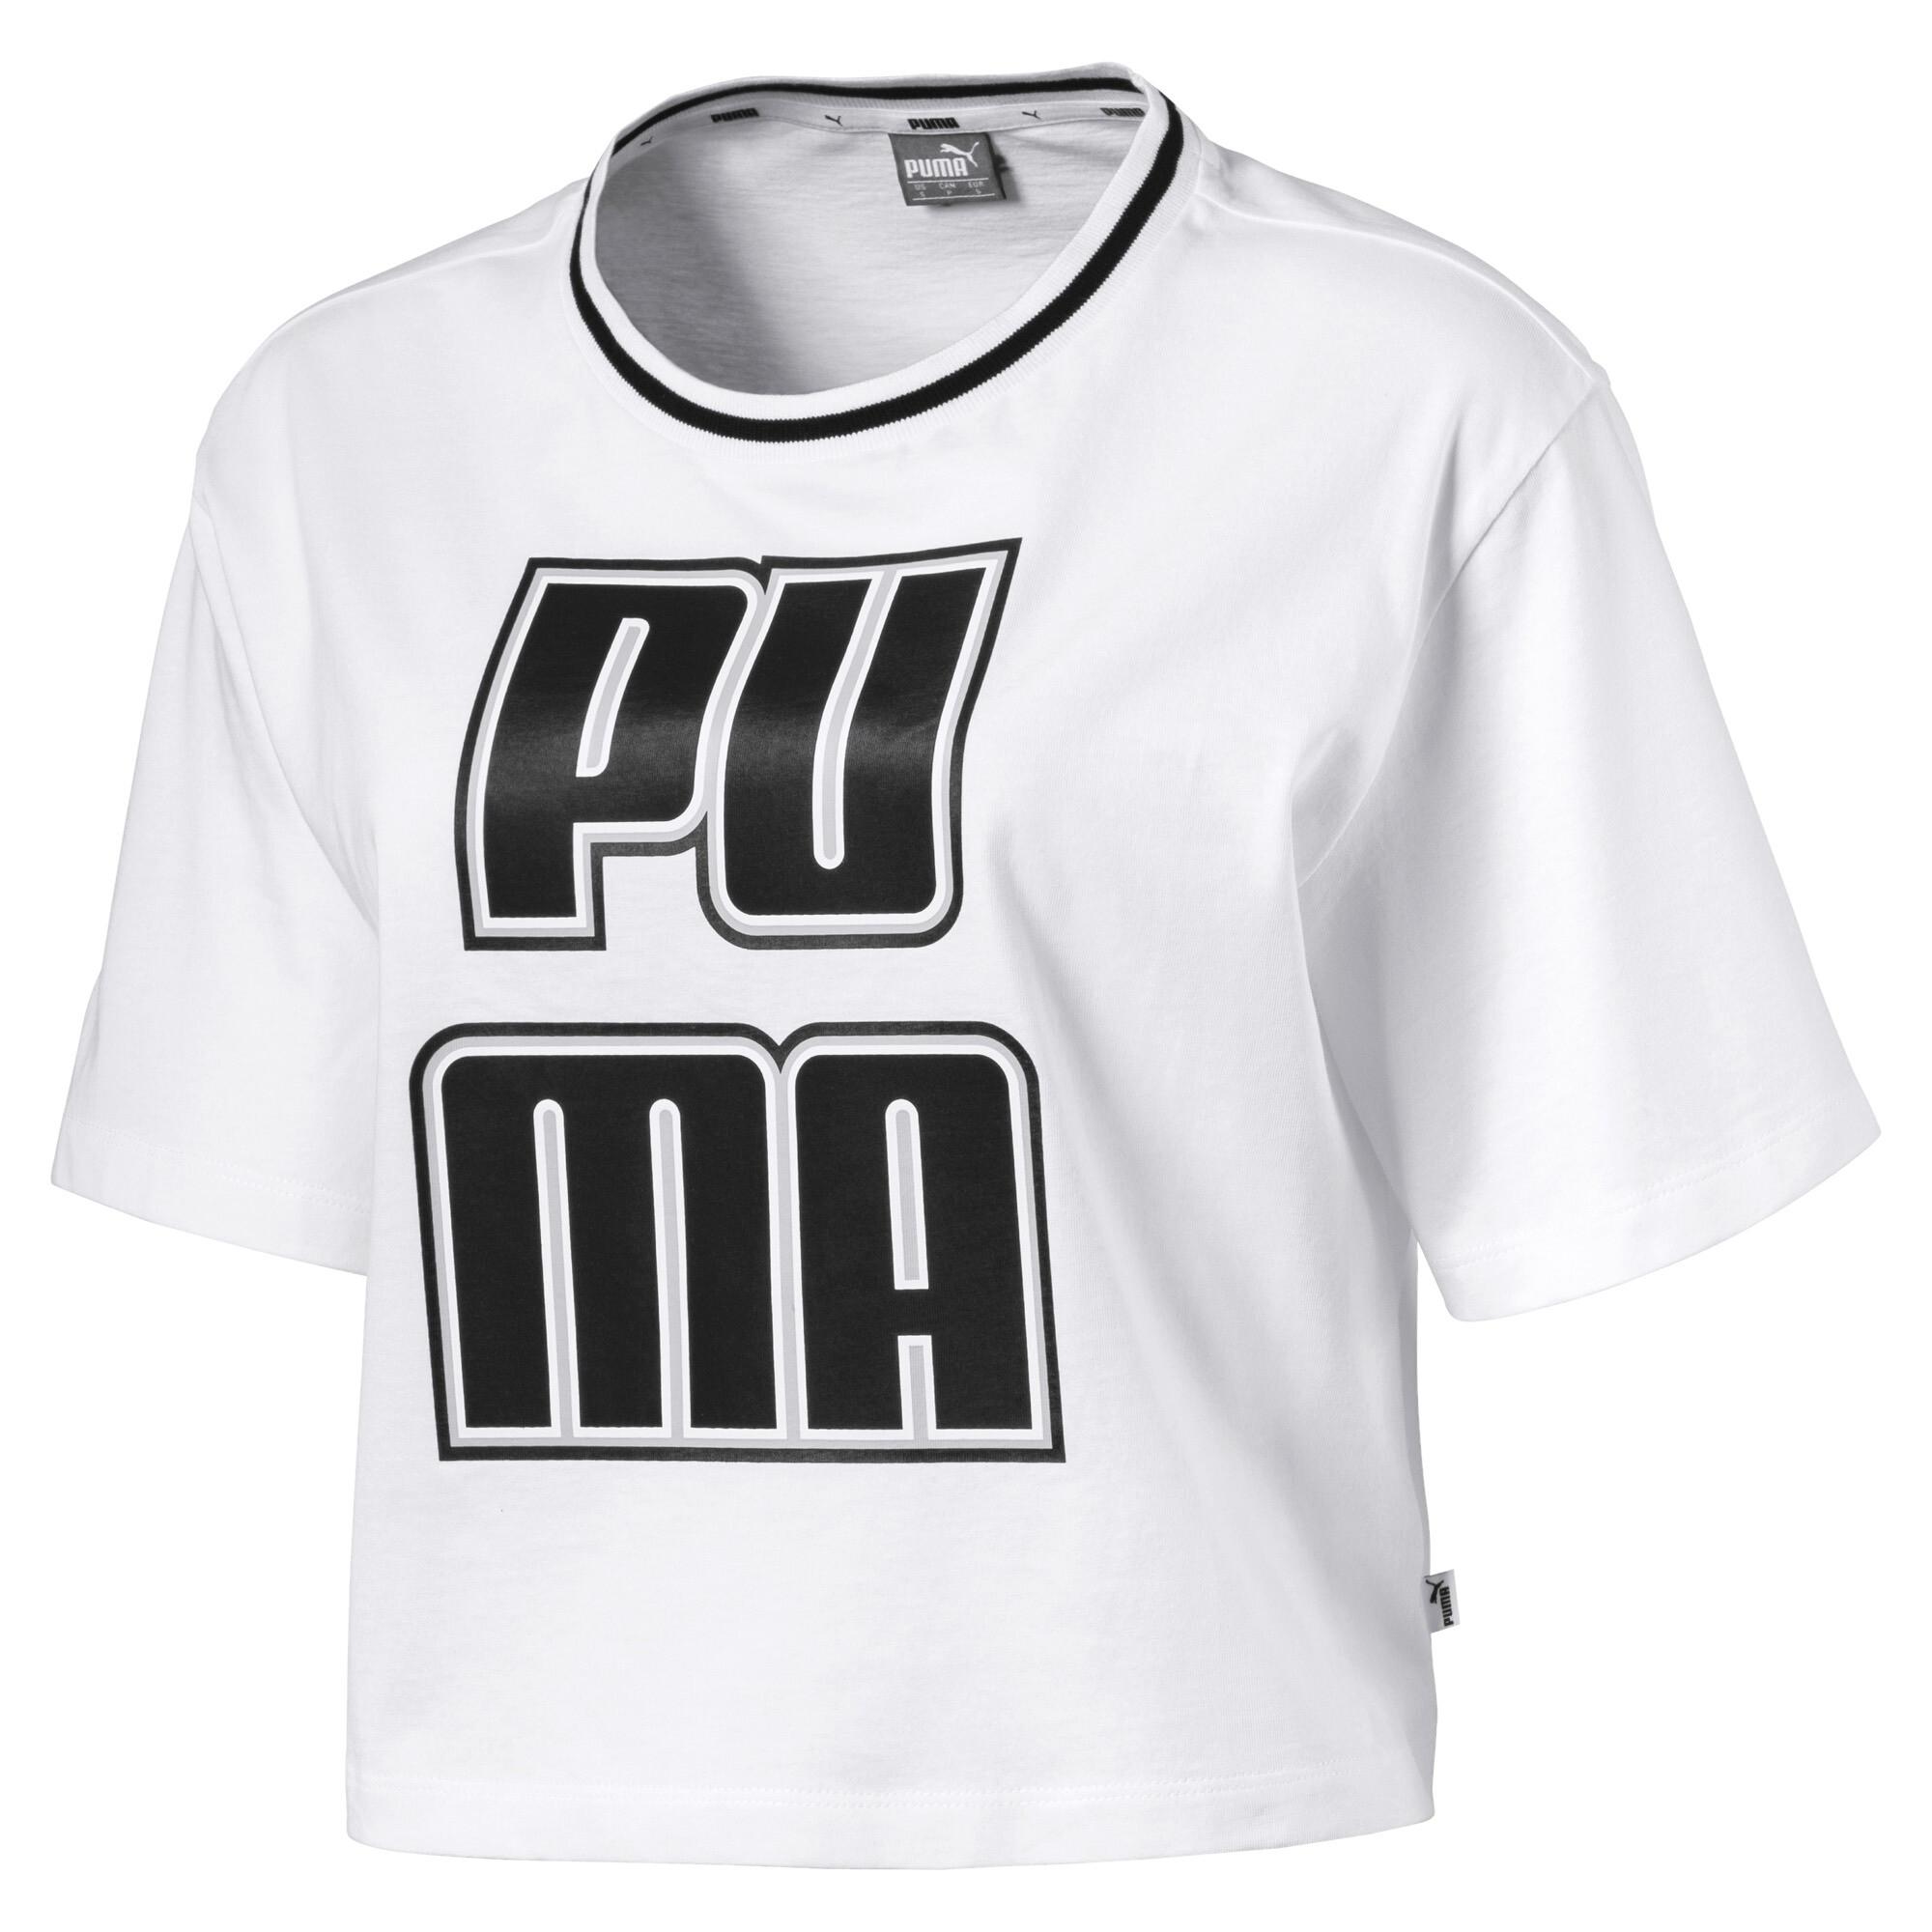 28560254246 T-Shirts - Clothing - Womens